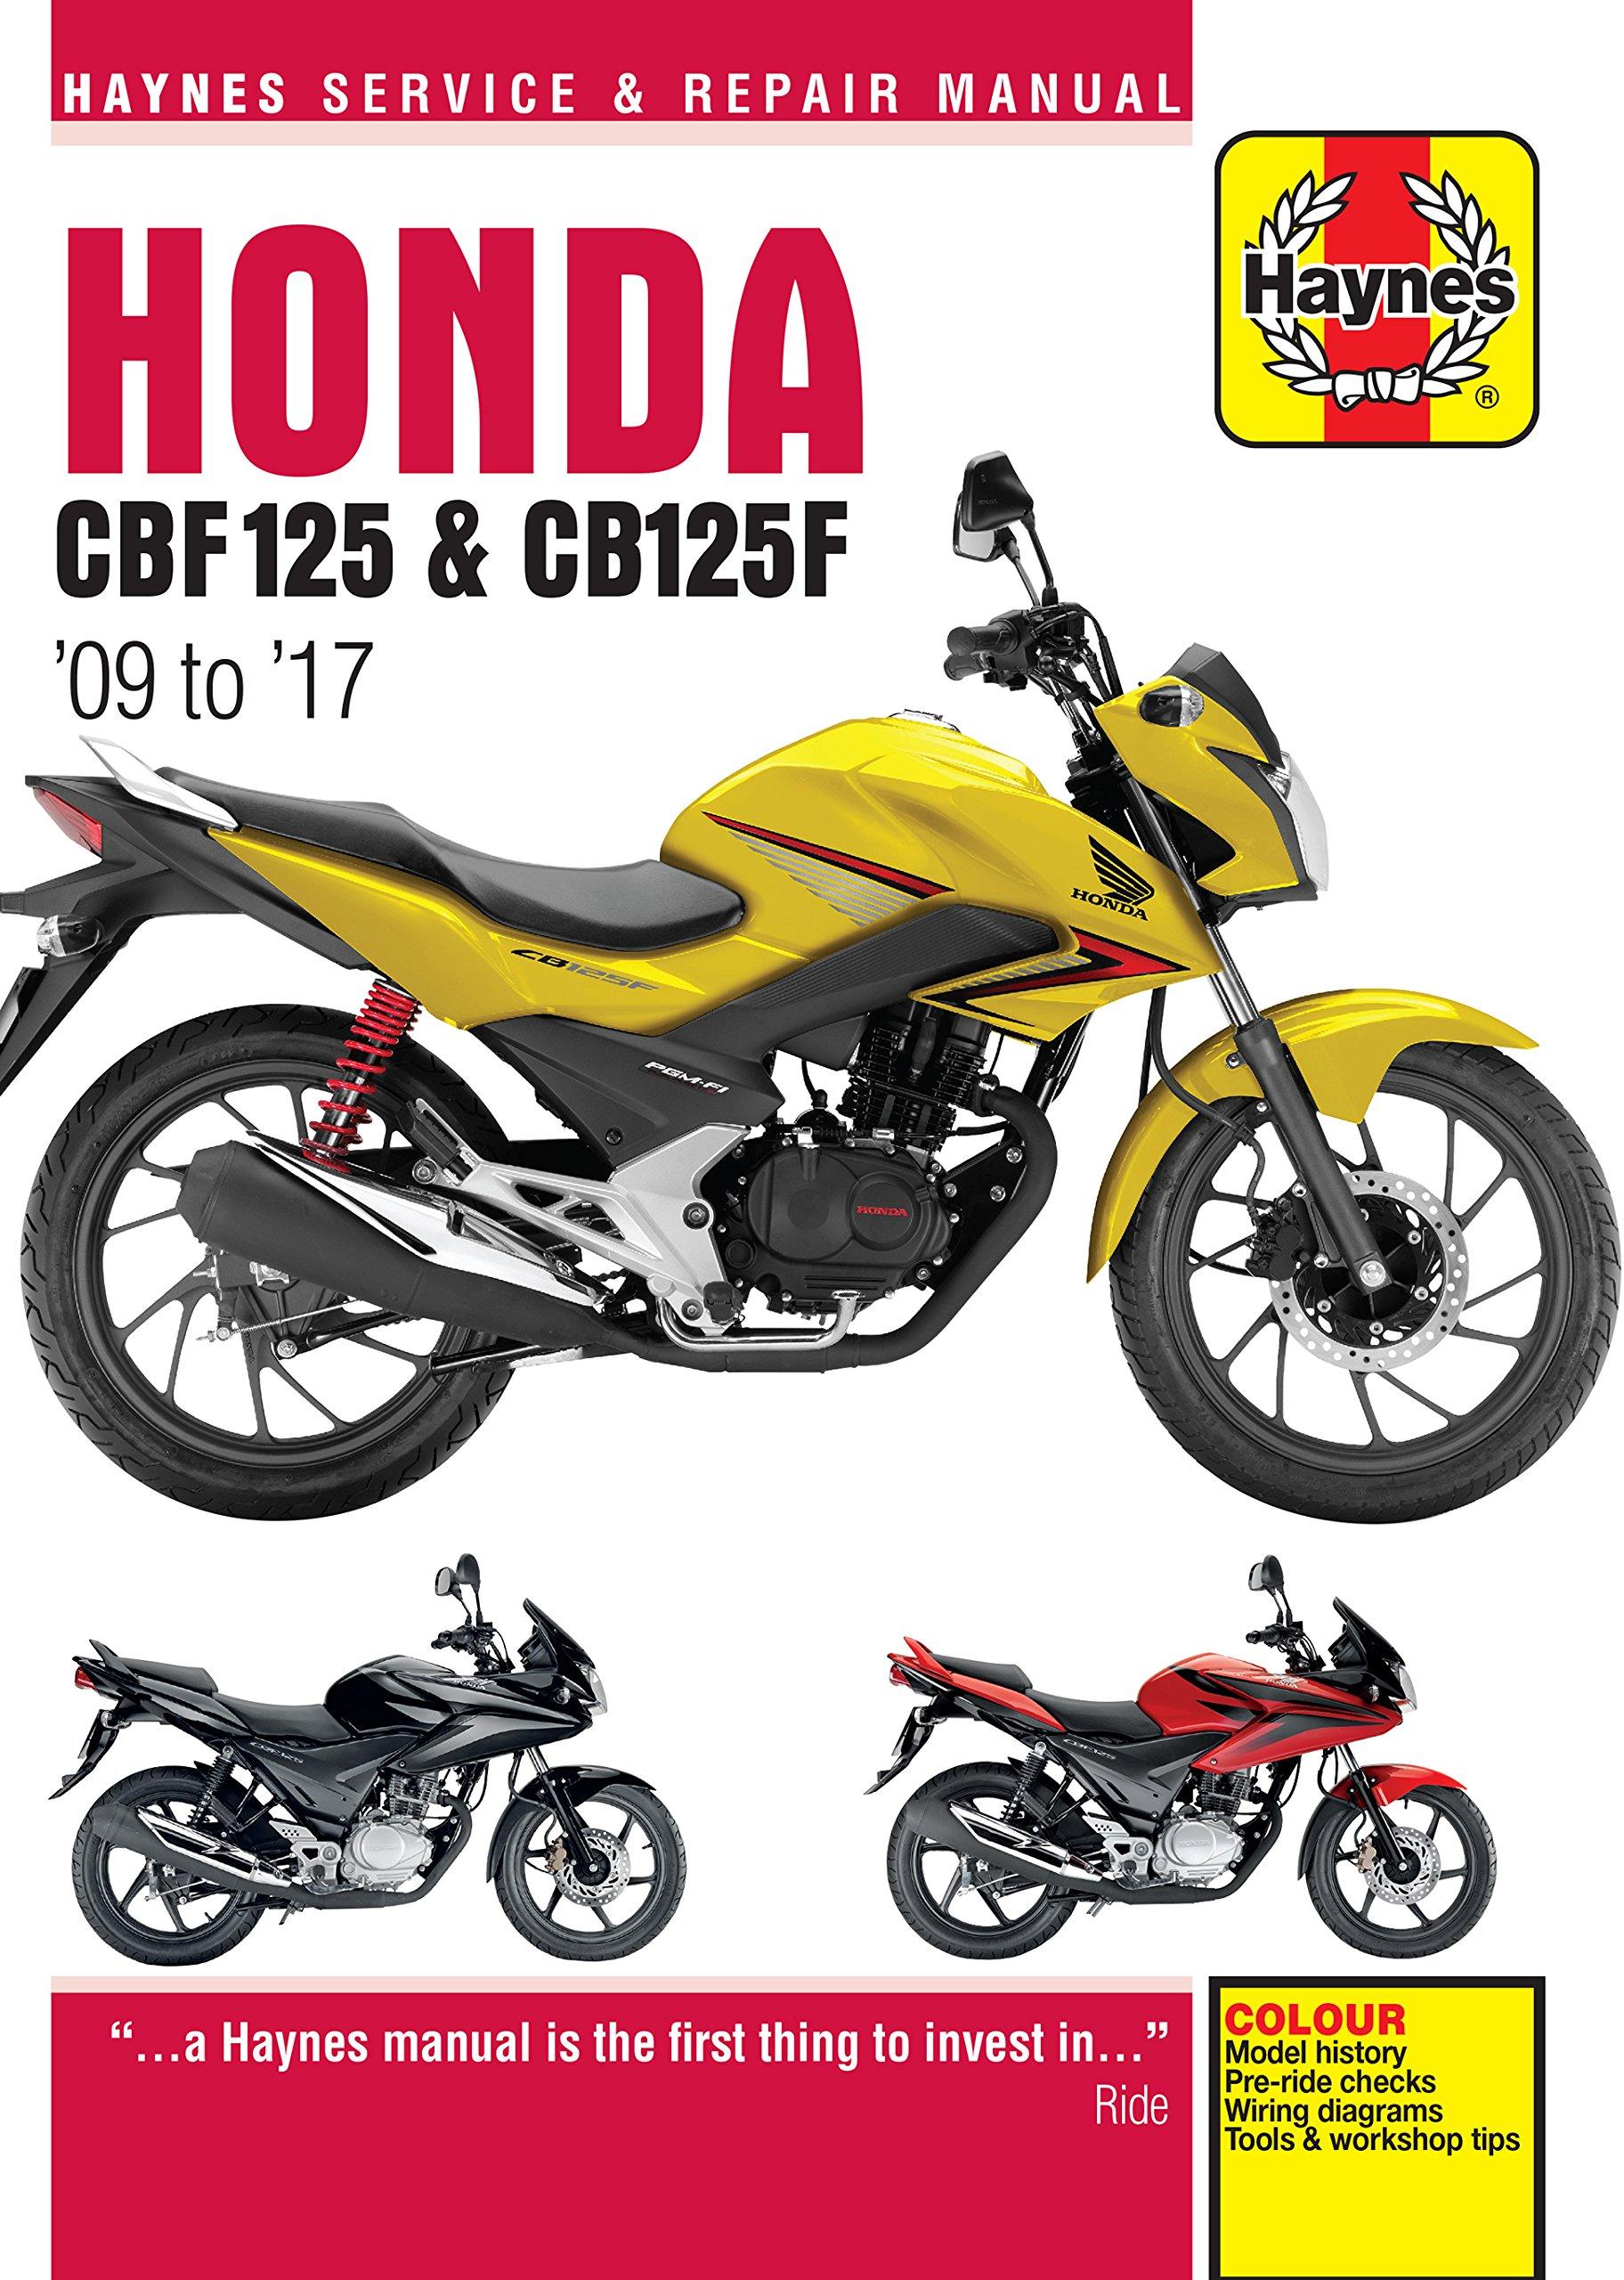 Honda Cbf125 Cb125f Update 5540 09 To 16 Phil Cbf 600 Wiring Diagram Mather 9781785213533 Books